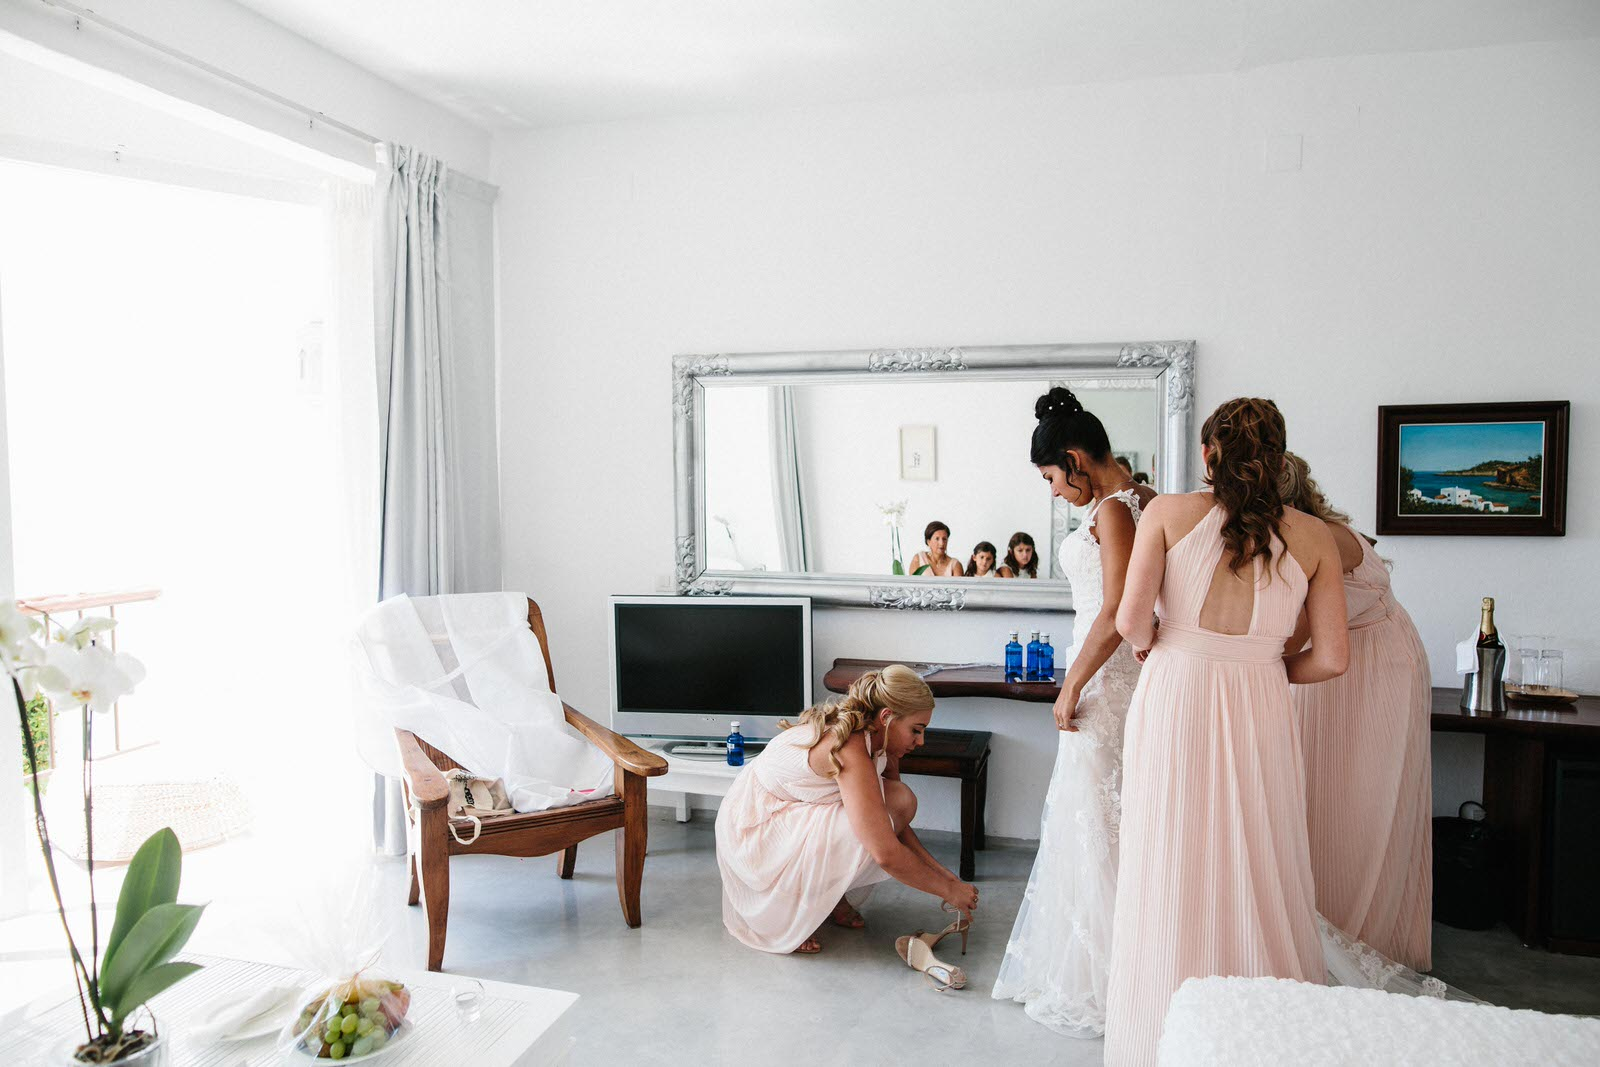 wedding-preparation-with-bridesmaids